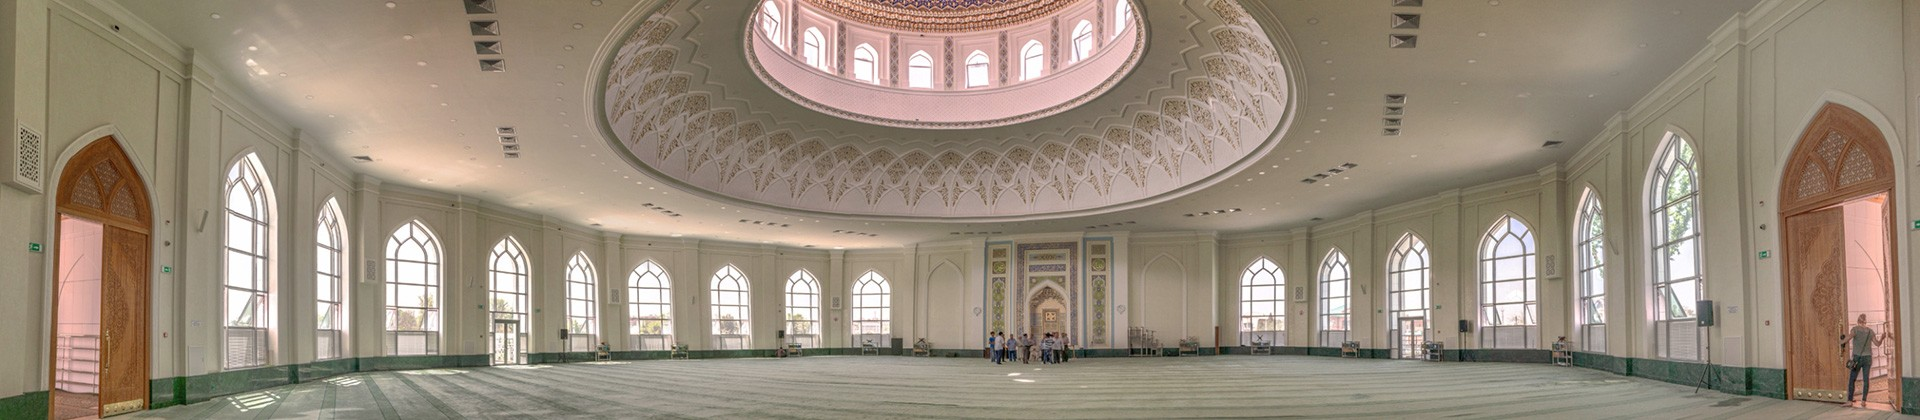 Minor Mosque - 1